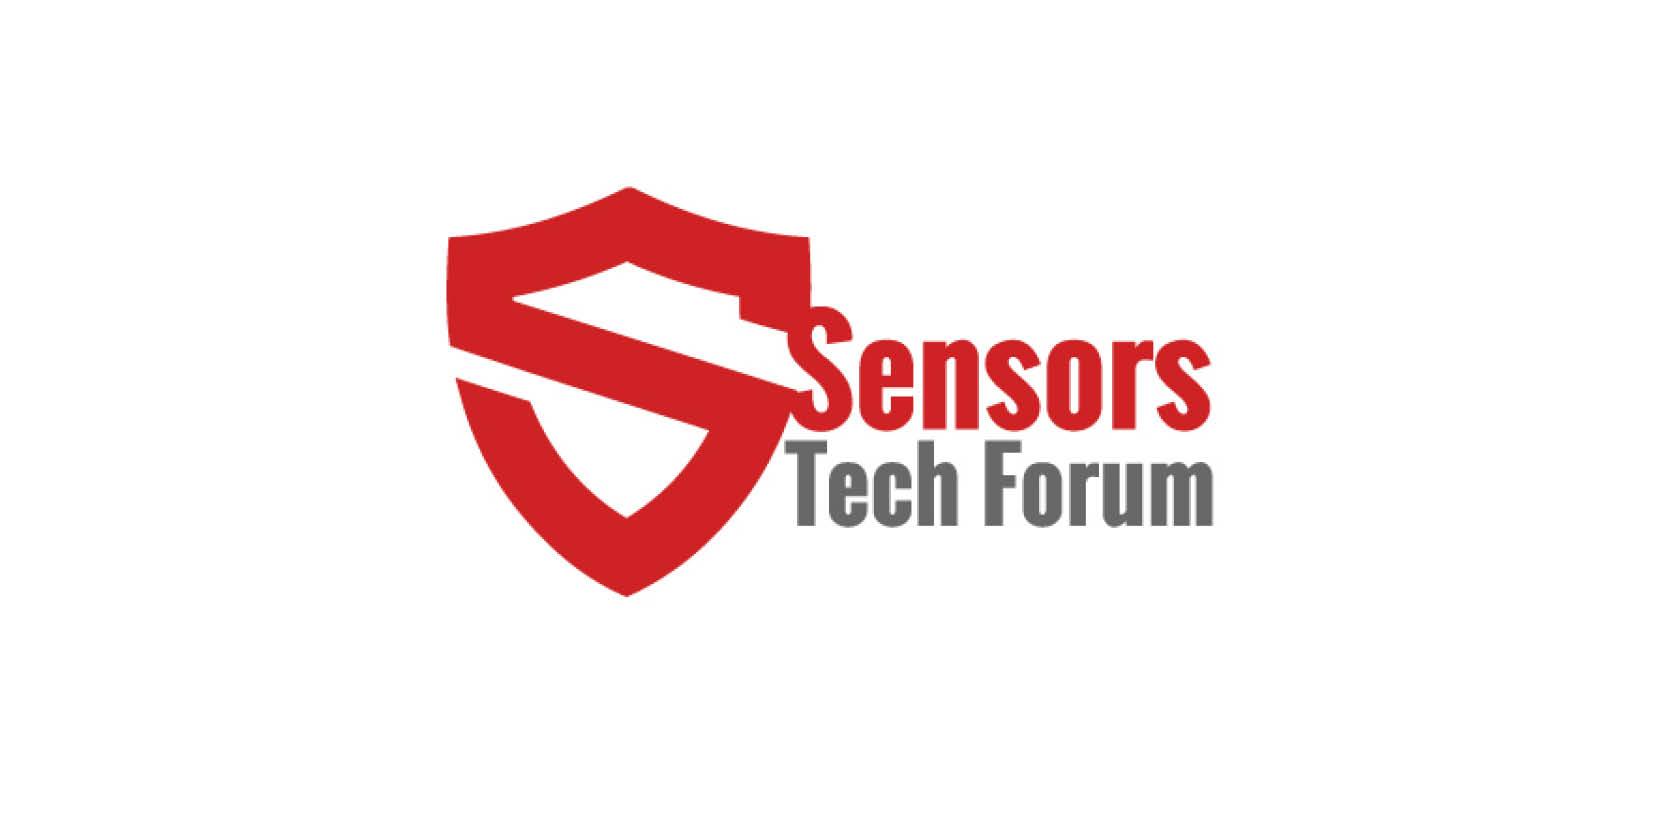 Sensors Tech Forum: Top 3 Vulnerabilities Used in 2016 Exploit Kit Attacks